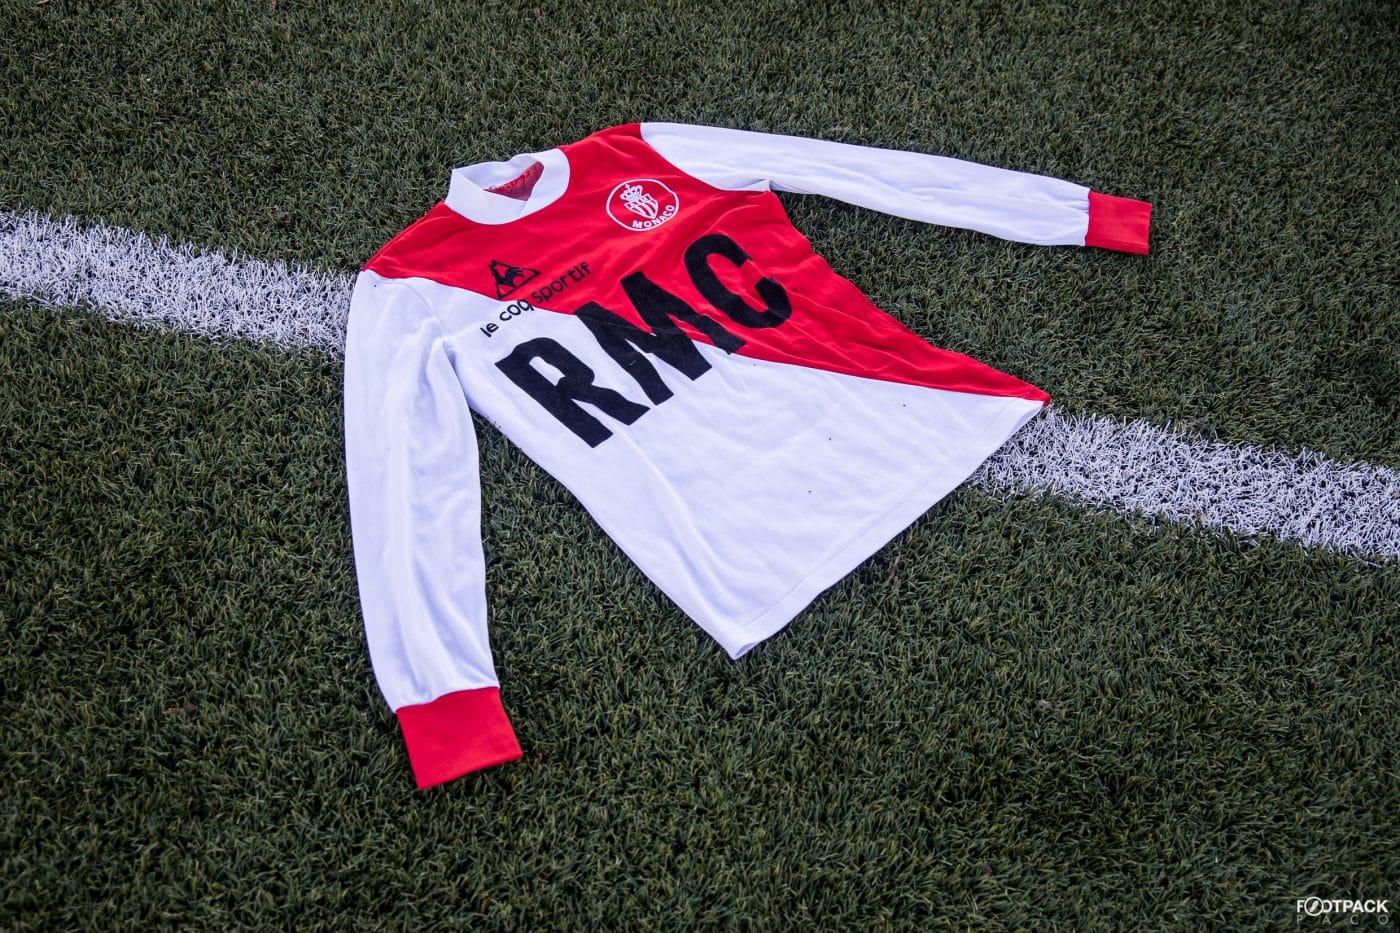 maillot-as-monaco-rmc-1977-1982-le-coq-sportif-3